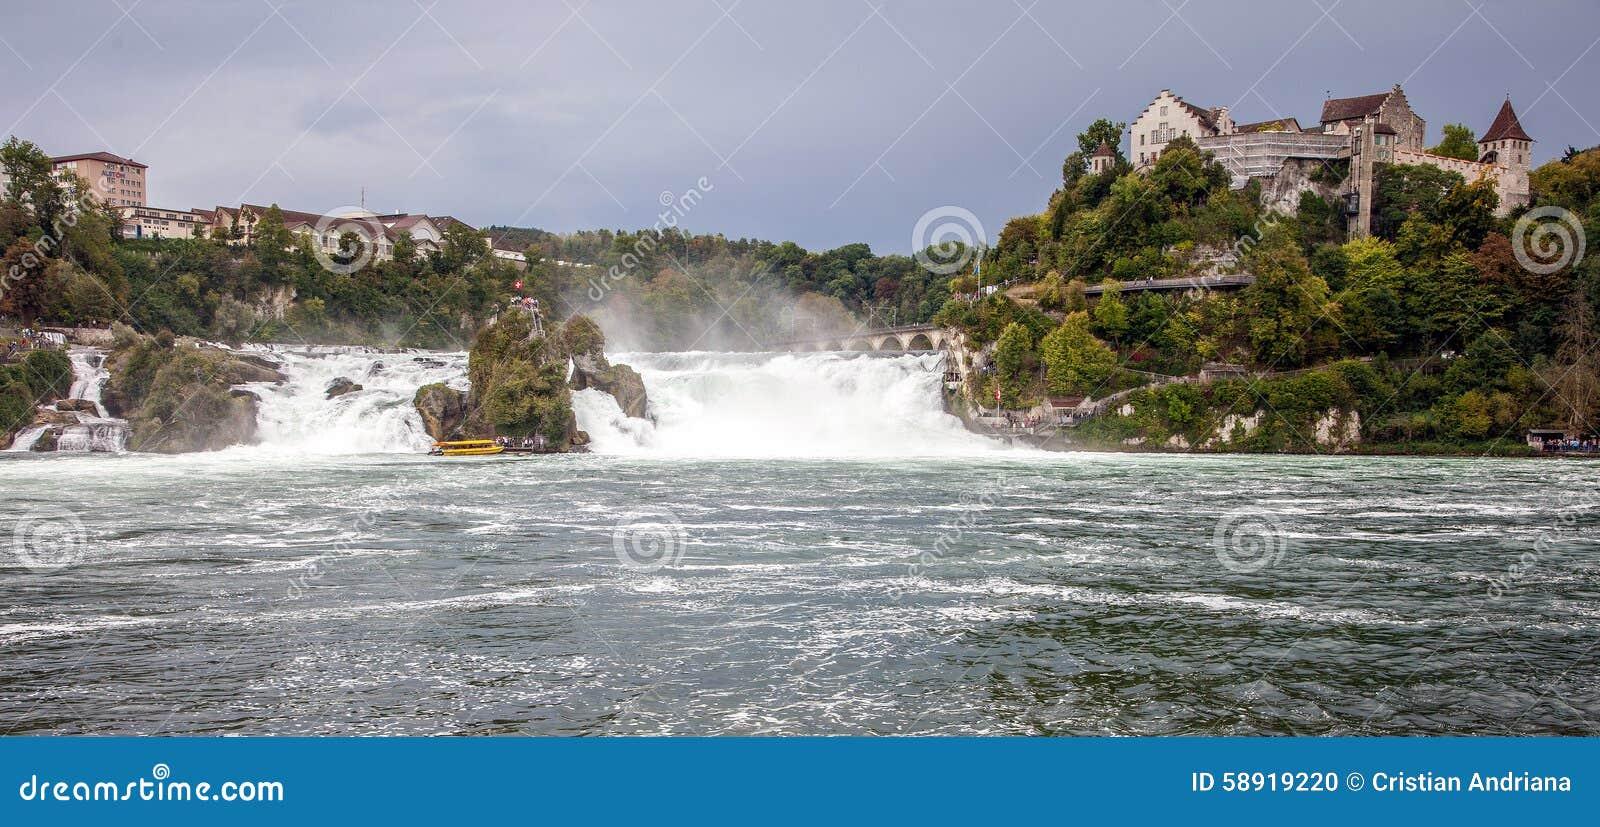 Watervallen Van Schaffhausen Zwitserland.Rijn Dalingen Grootste Waterval In Europa Schaffhausen